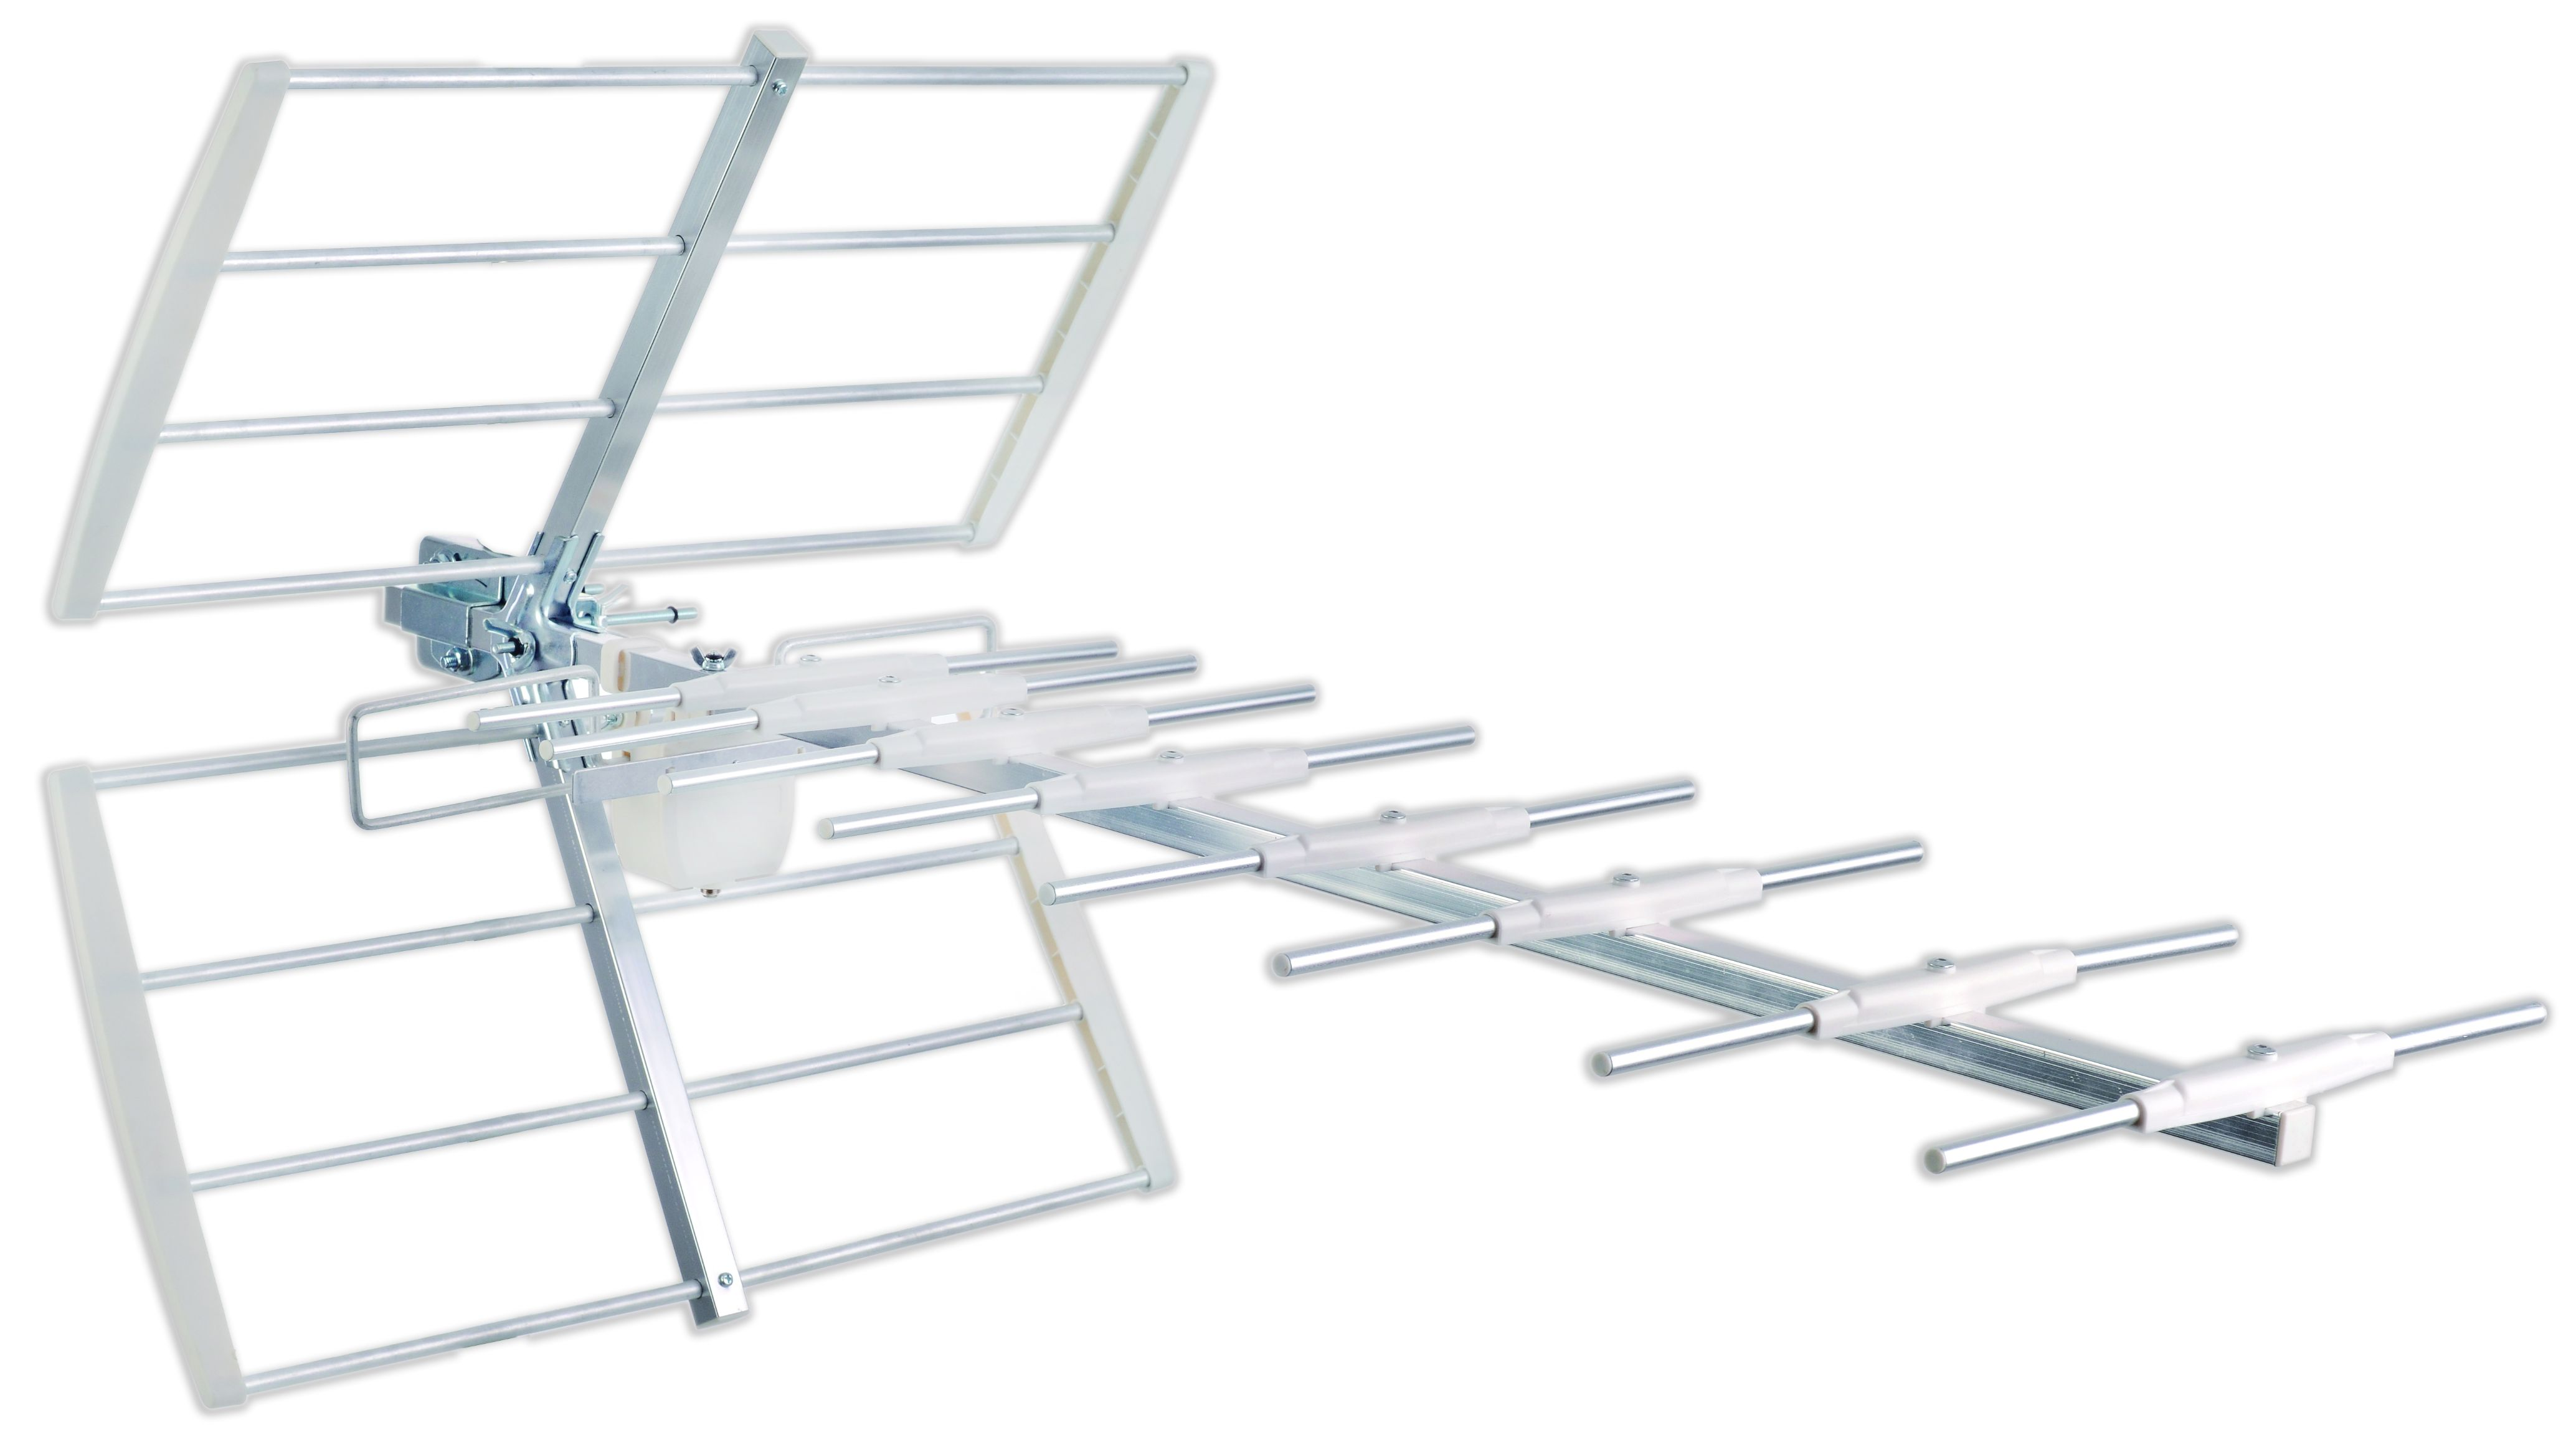 antenne uhf 21 48 gain13 db fagor. Black Bedroom Furniture Sets. Home Design Ideas